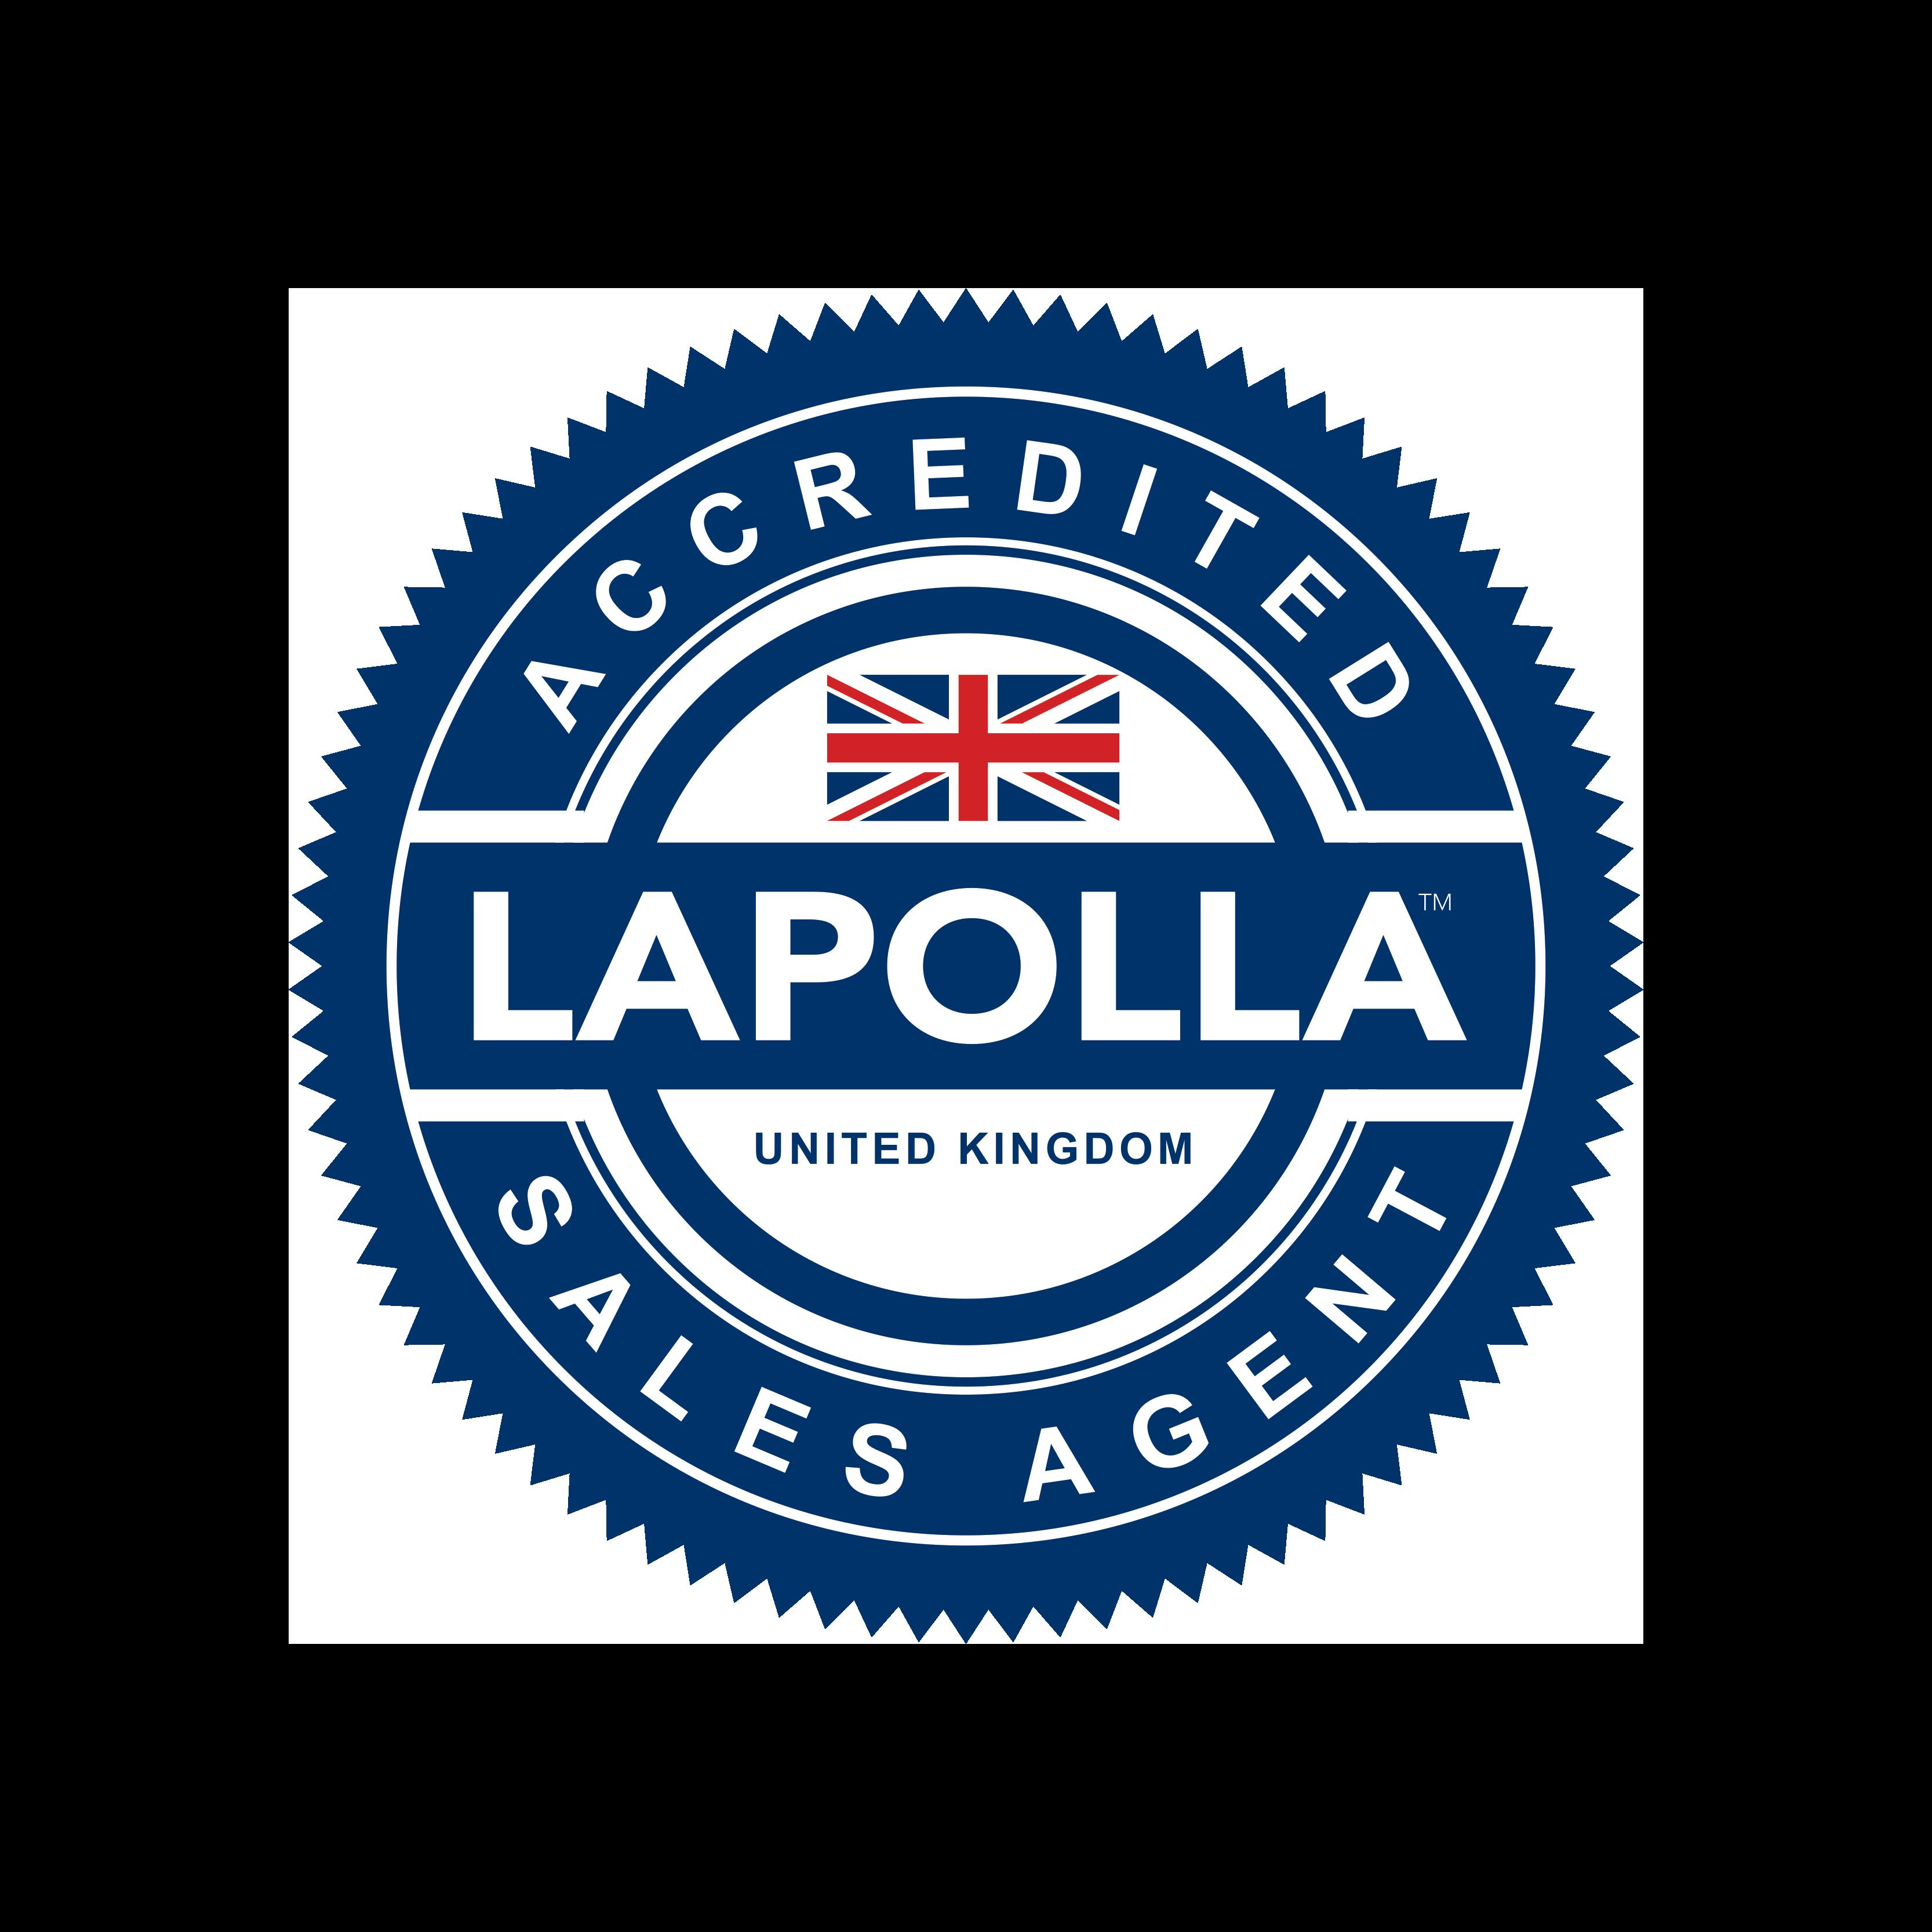 Lapolla UK Accredited Sales Agent Logo